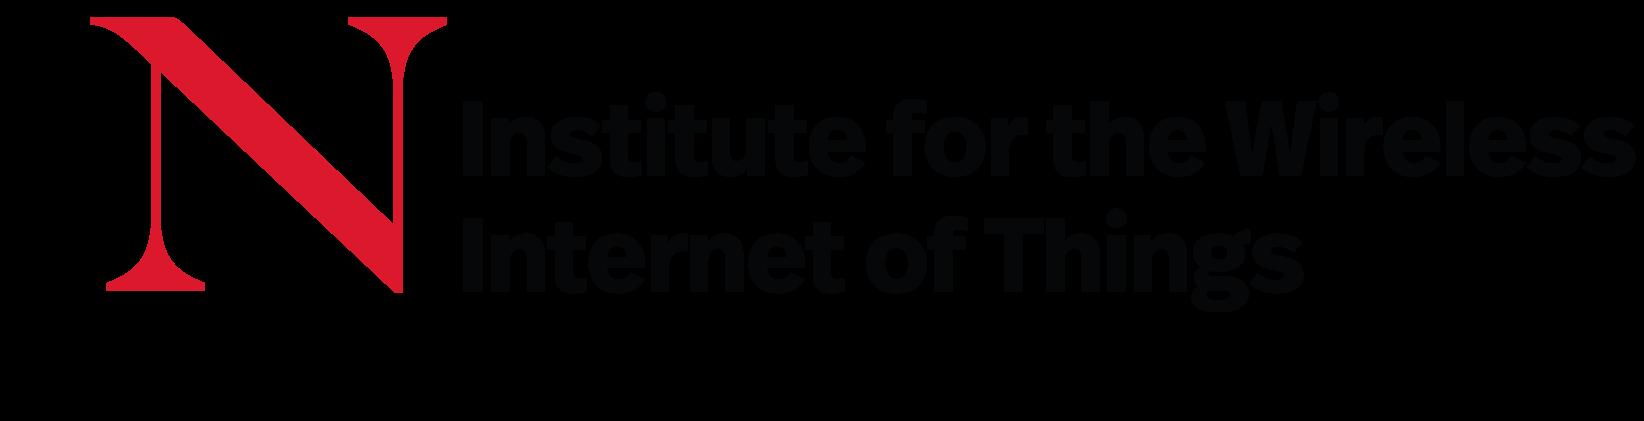 WIoT Logo